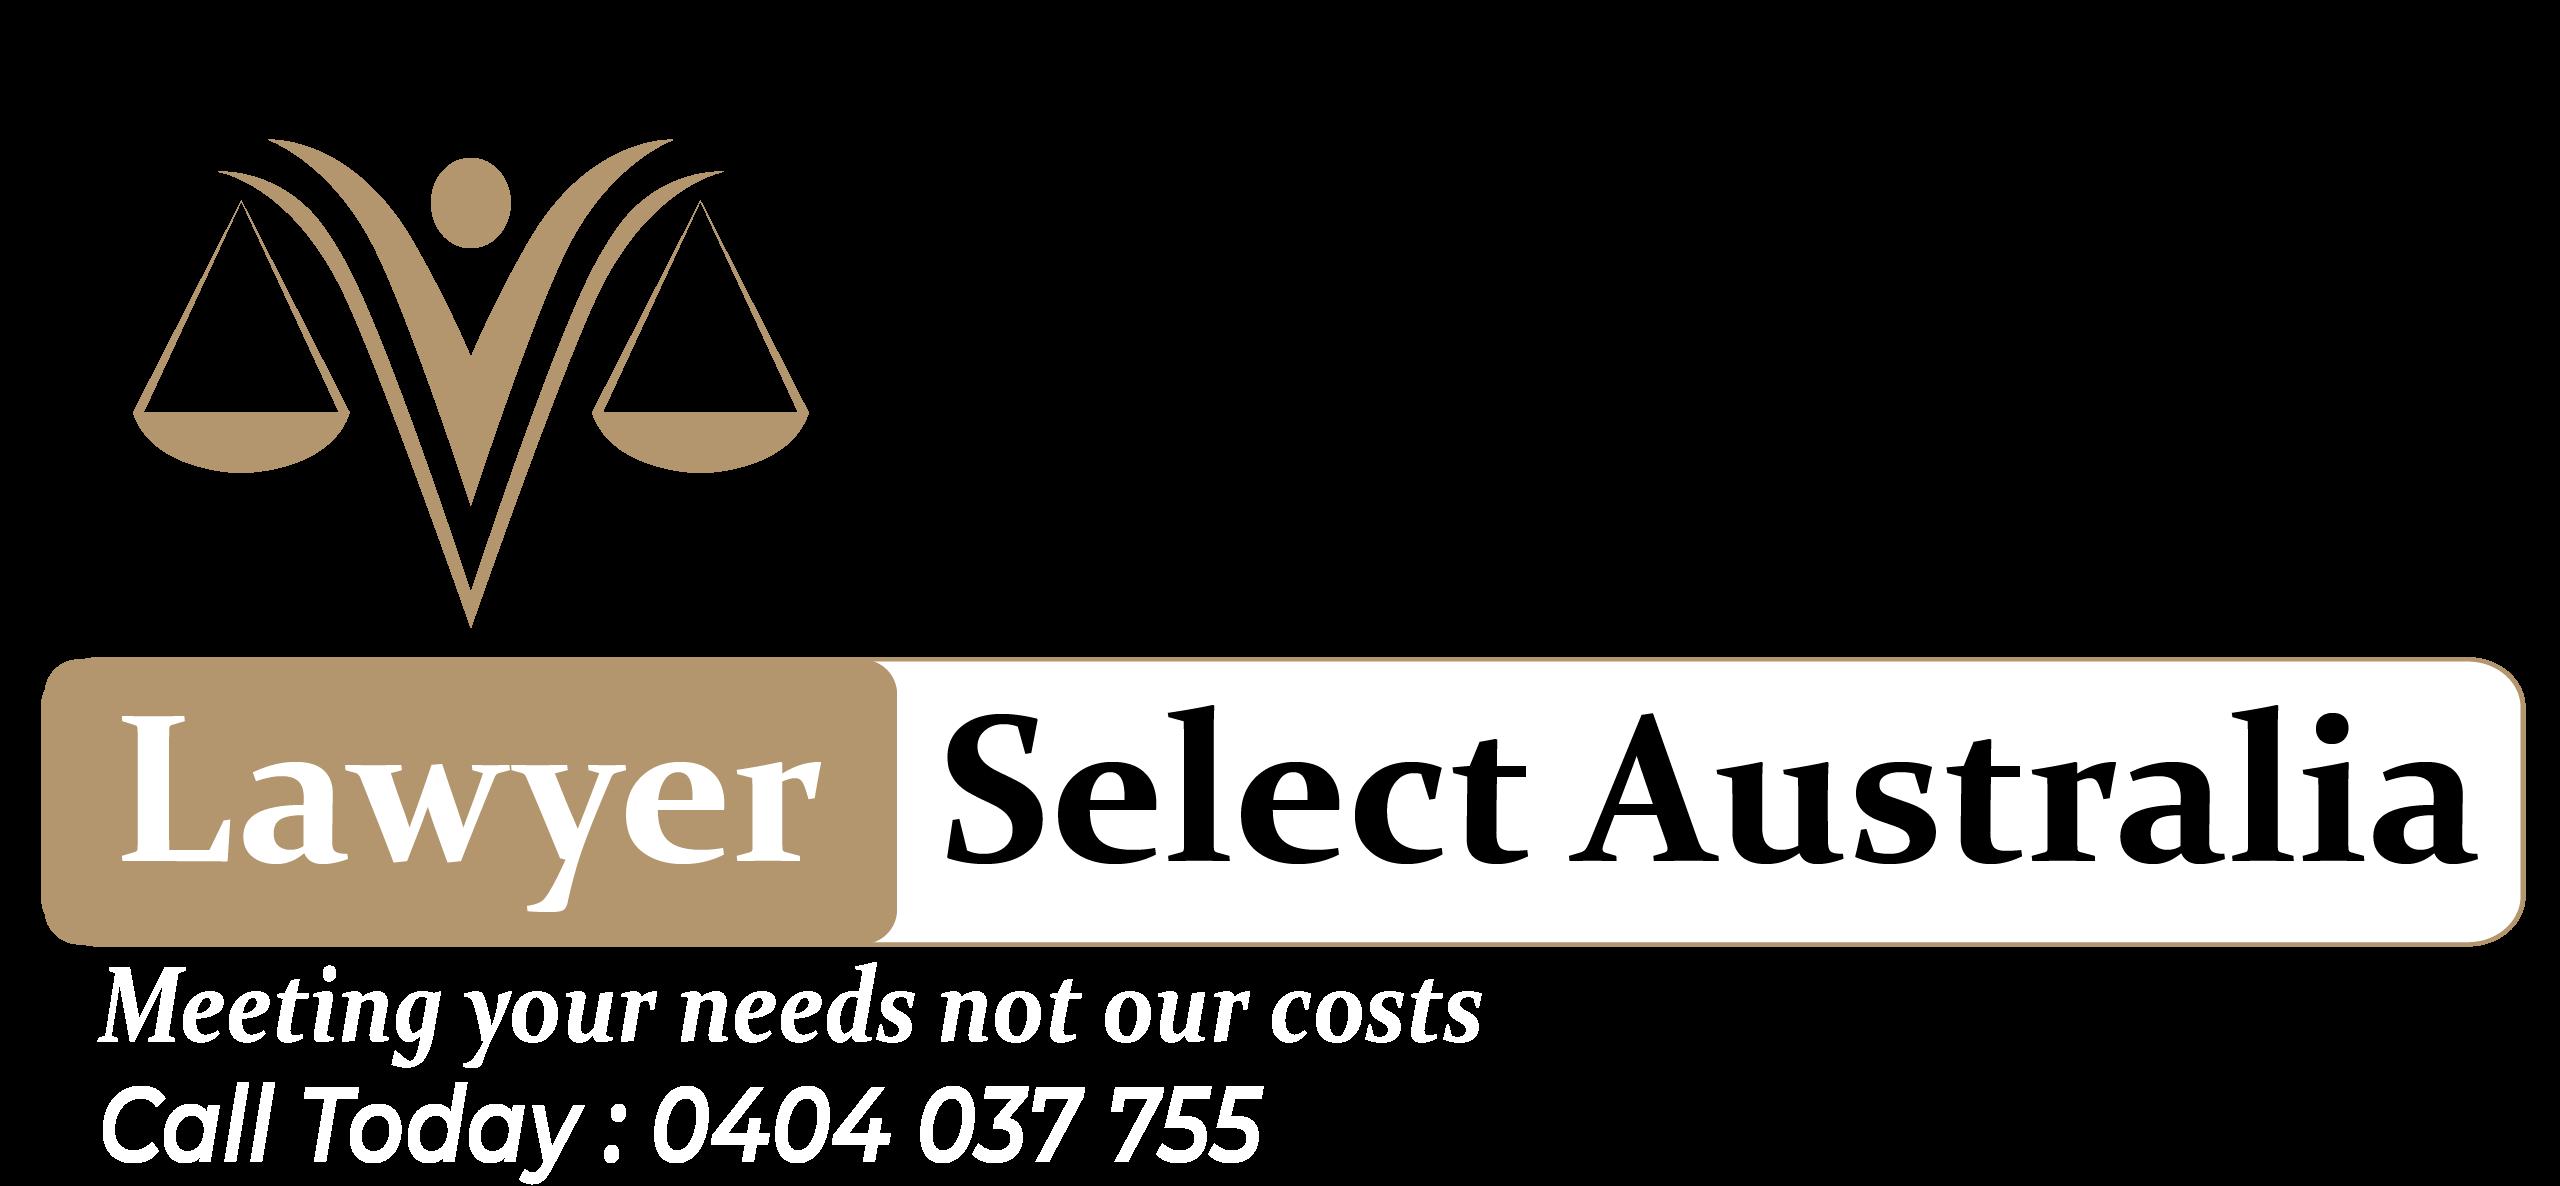 Lawyer Select Australia